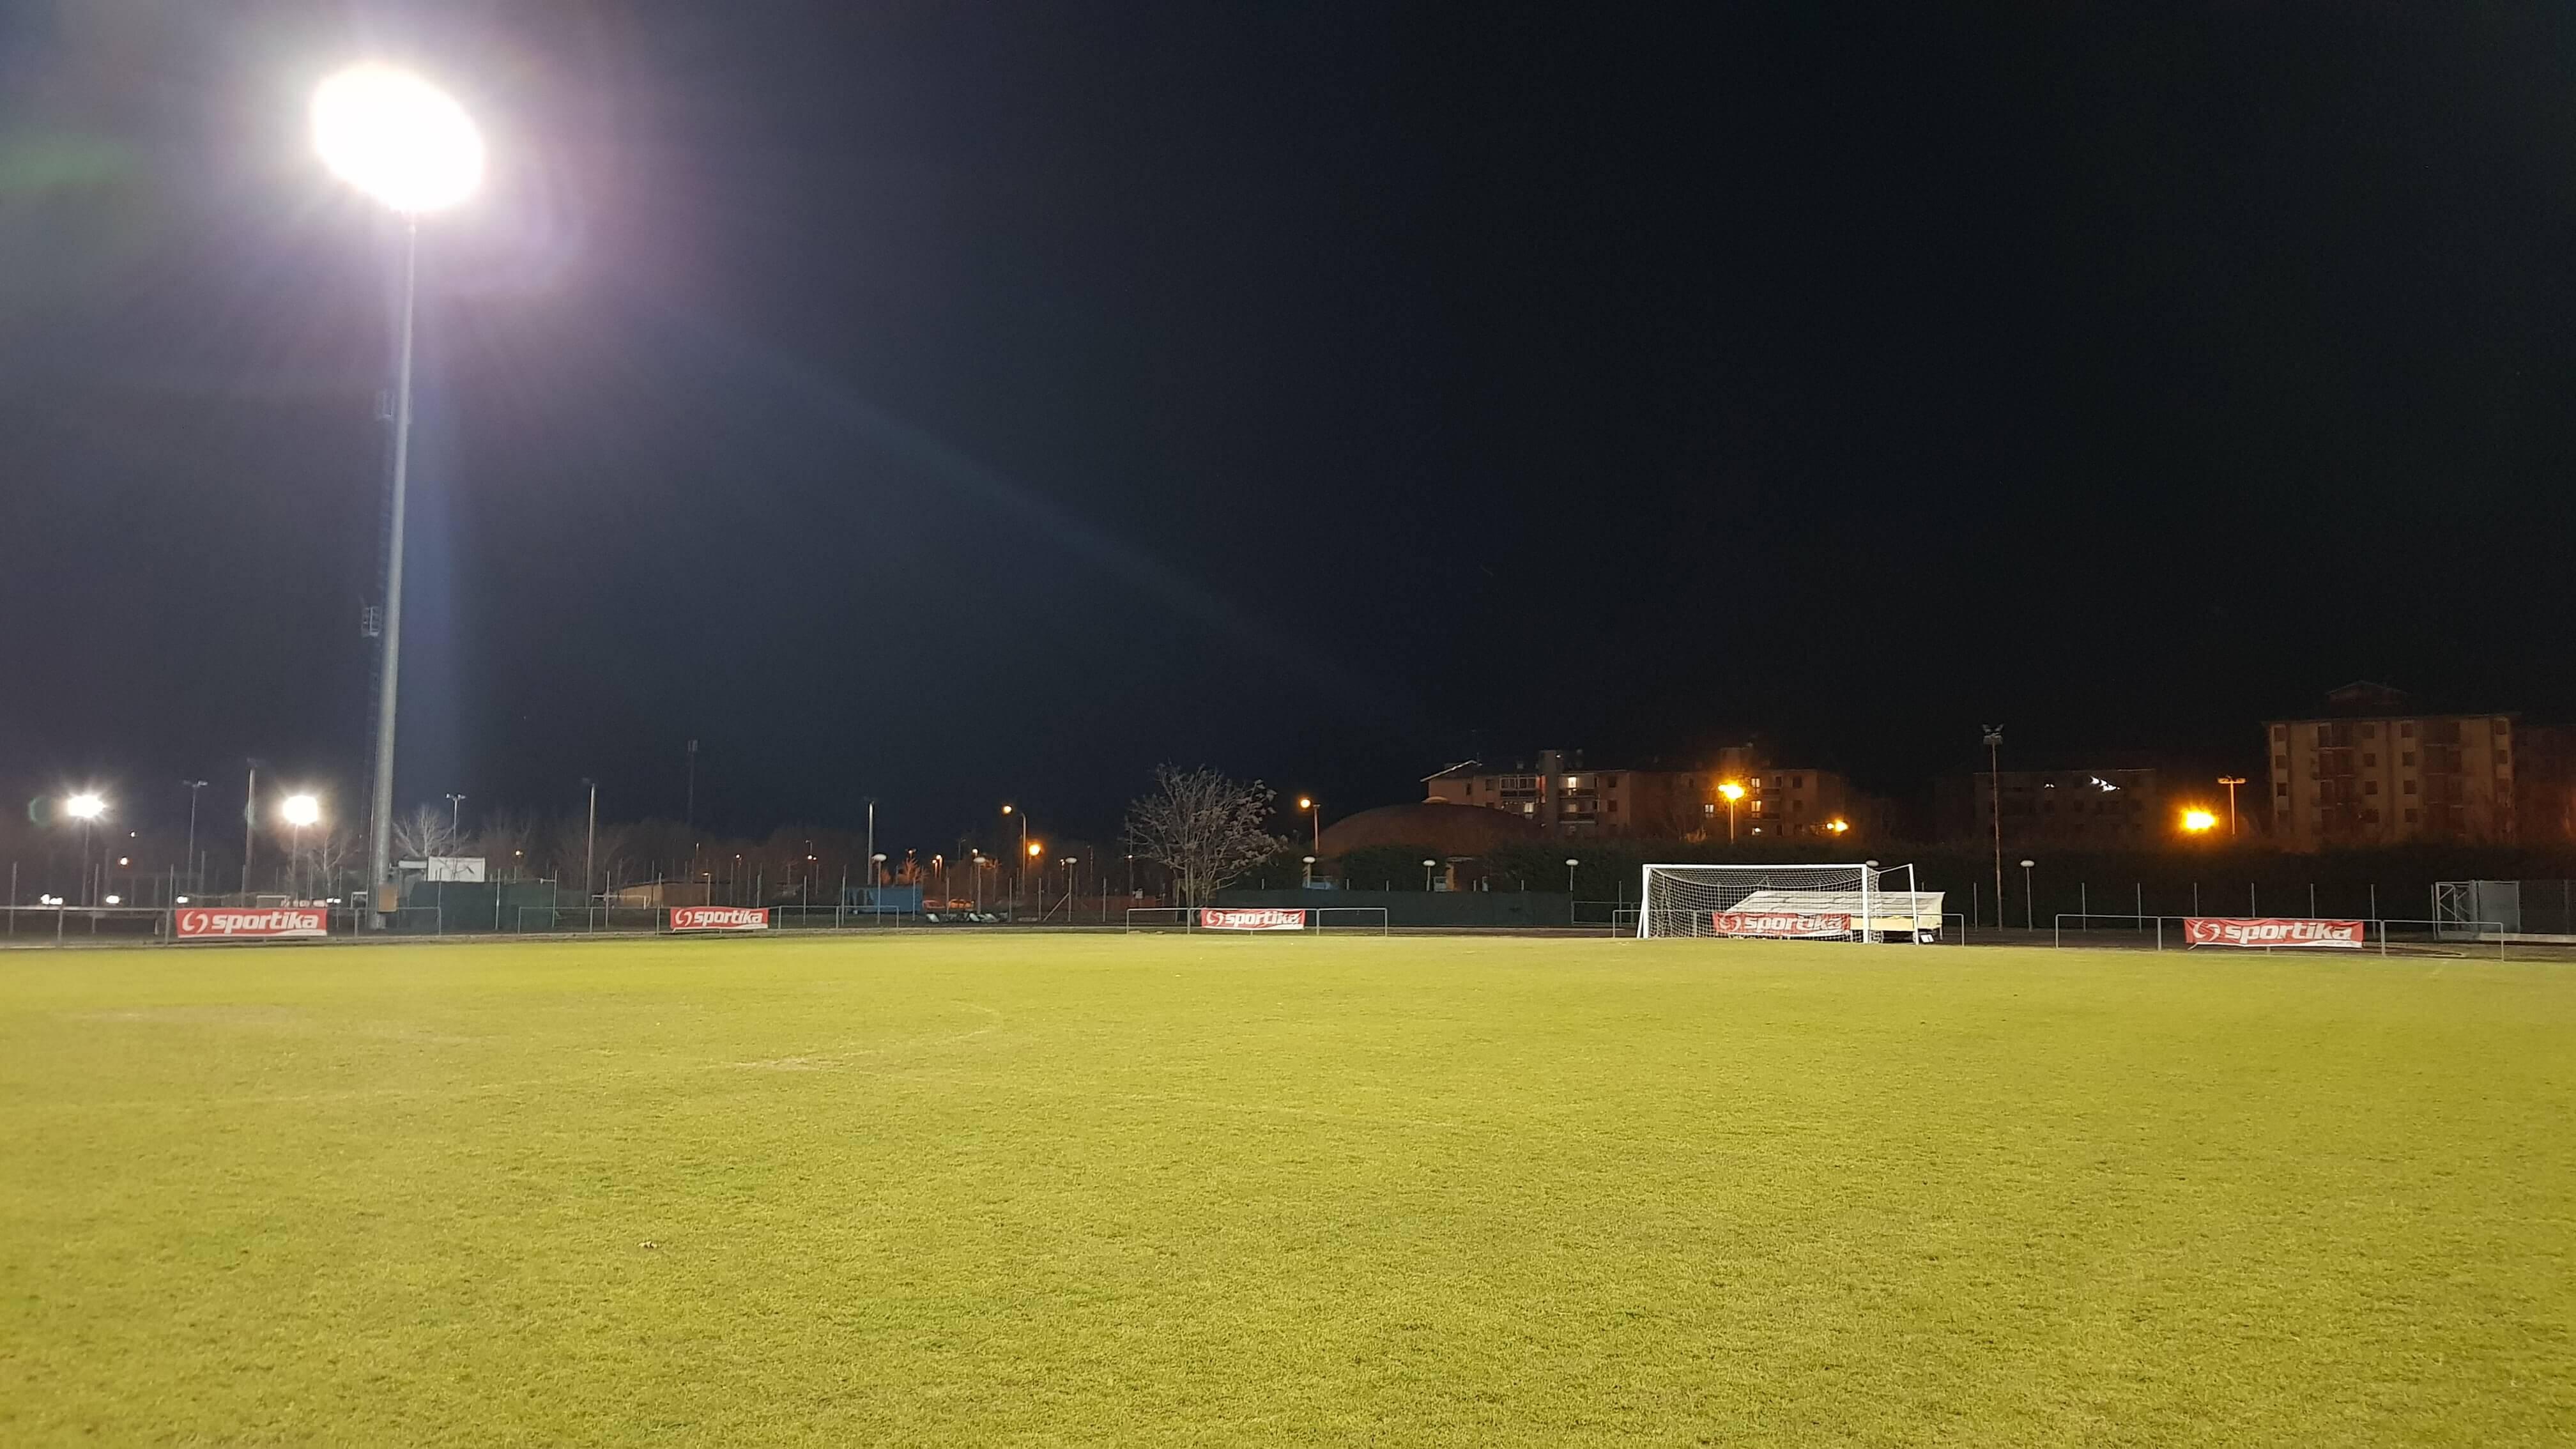 Stadio-costante-girardengo-novi-ligure-al-3